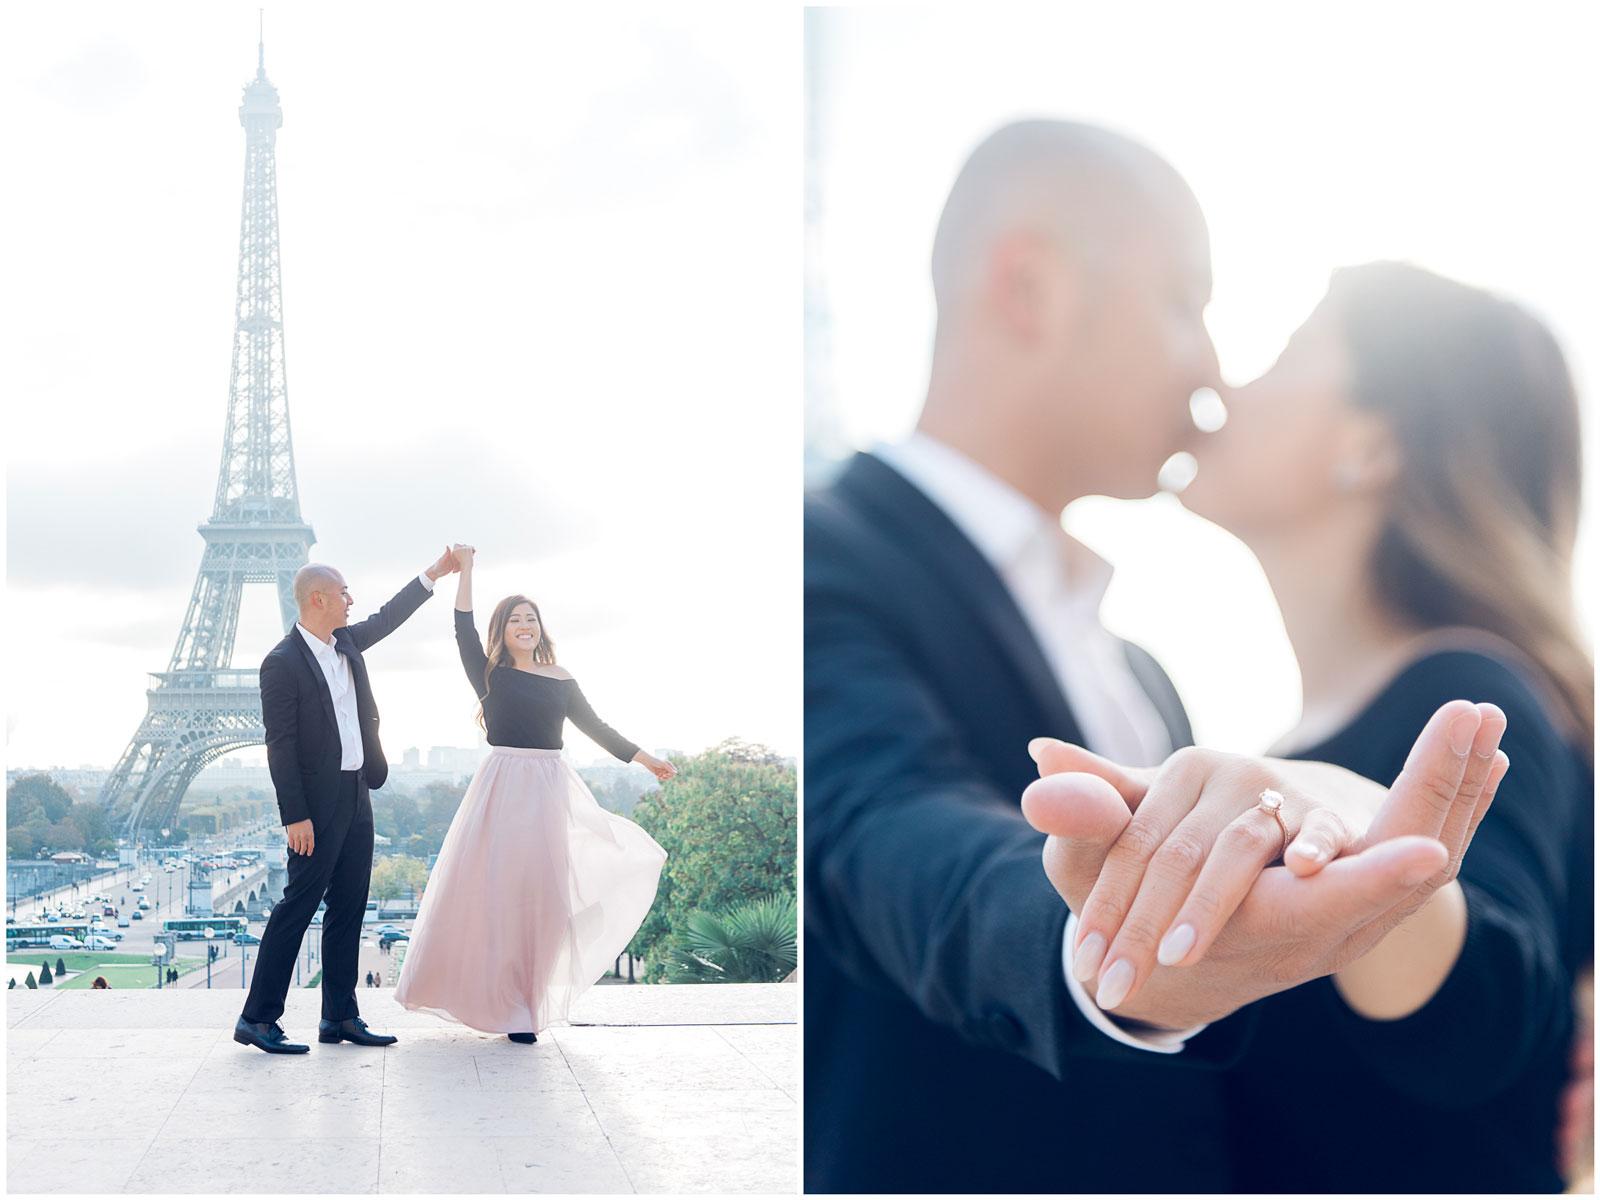 Paris engagement photographer - proposal photo shoot at the Eiffel Tower